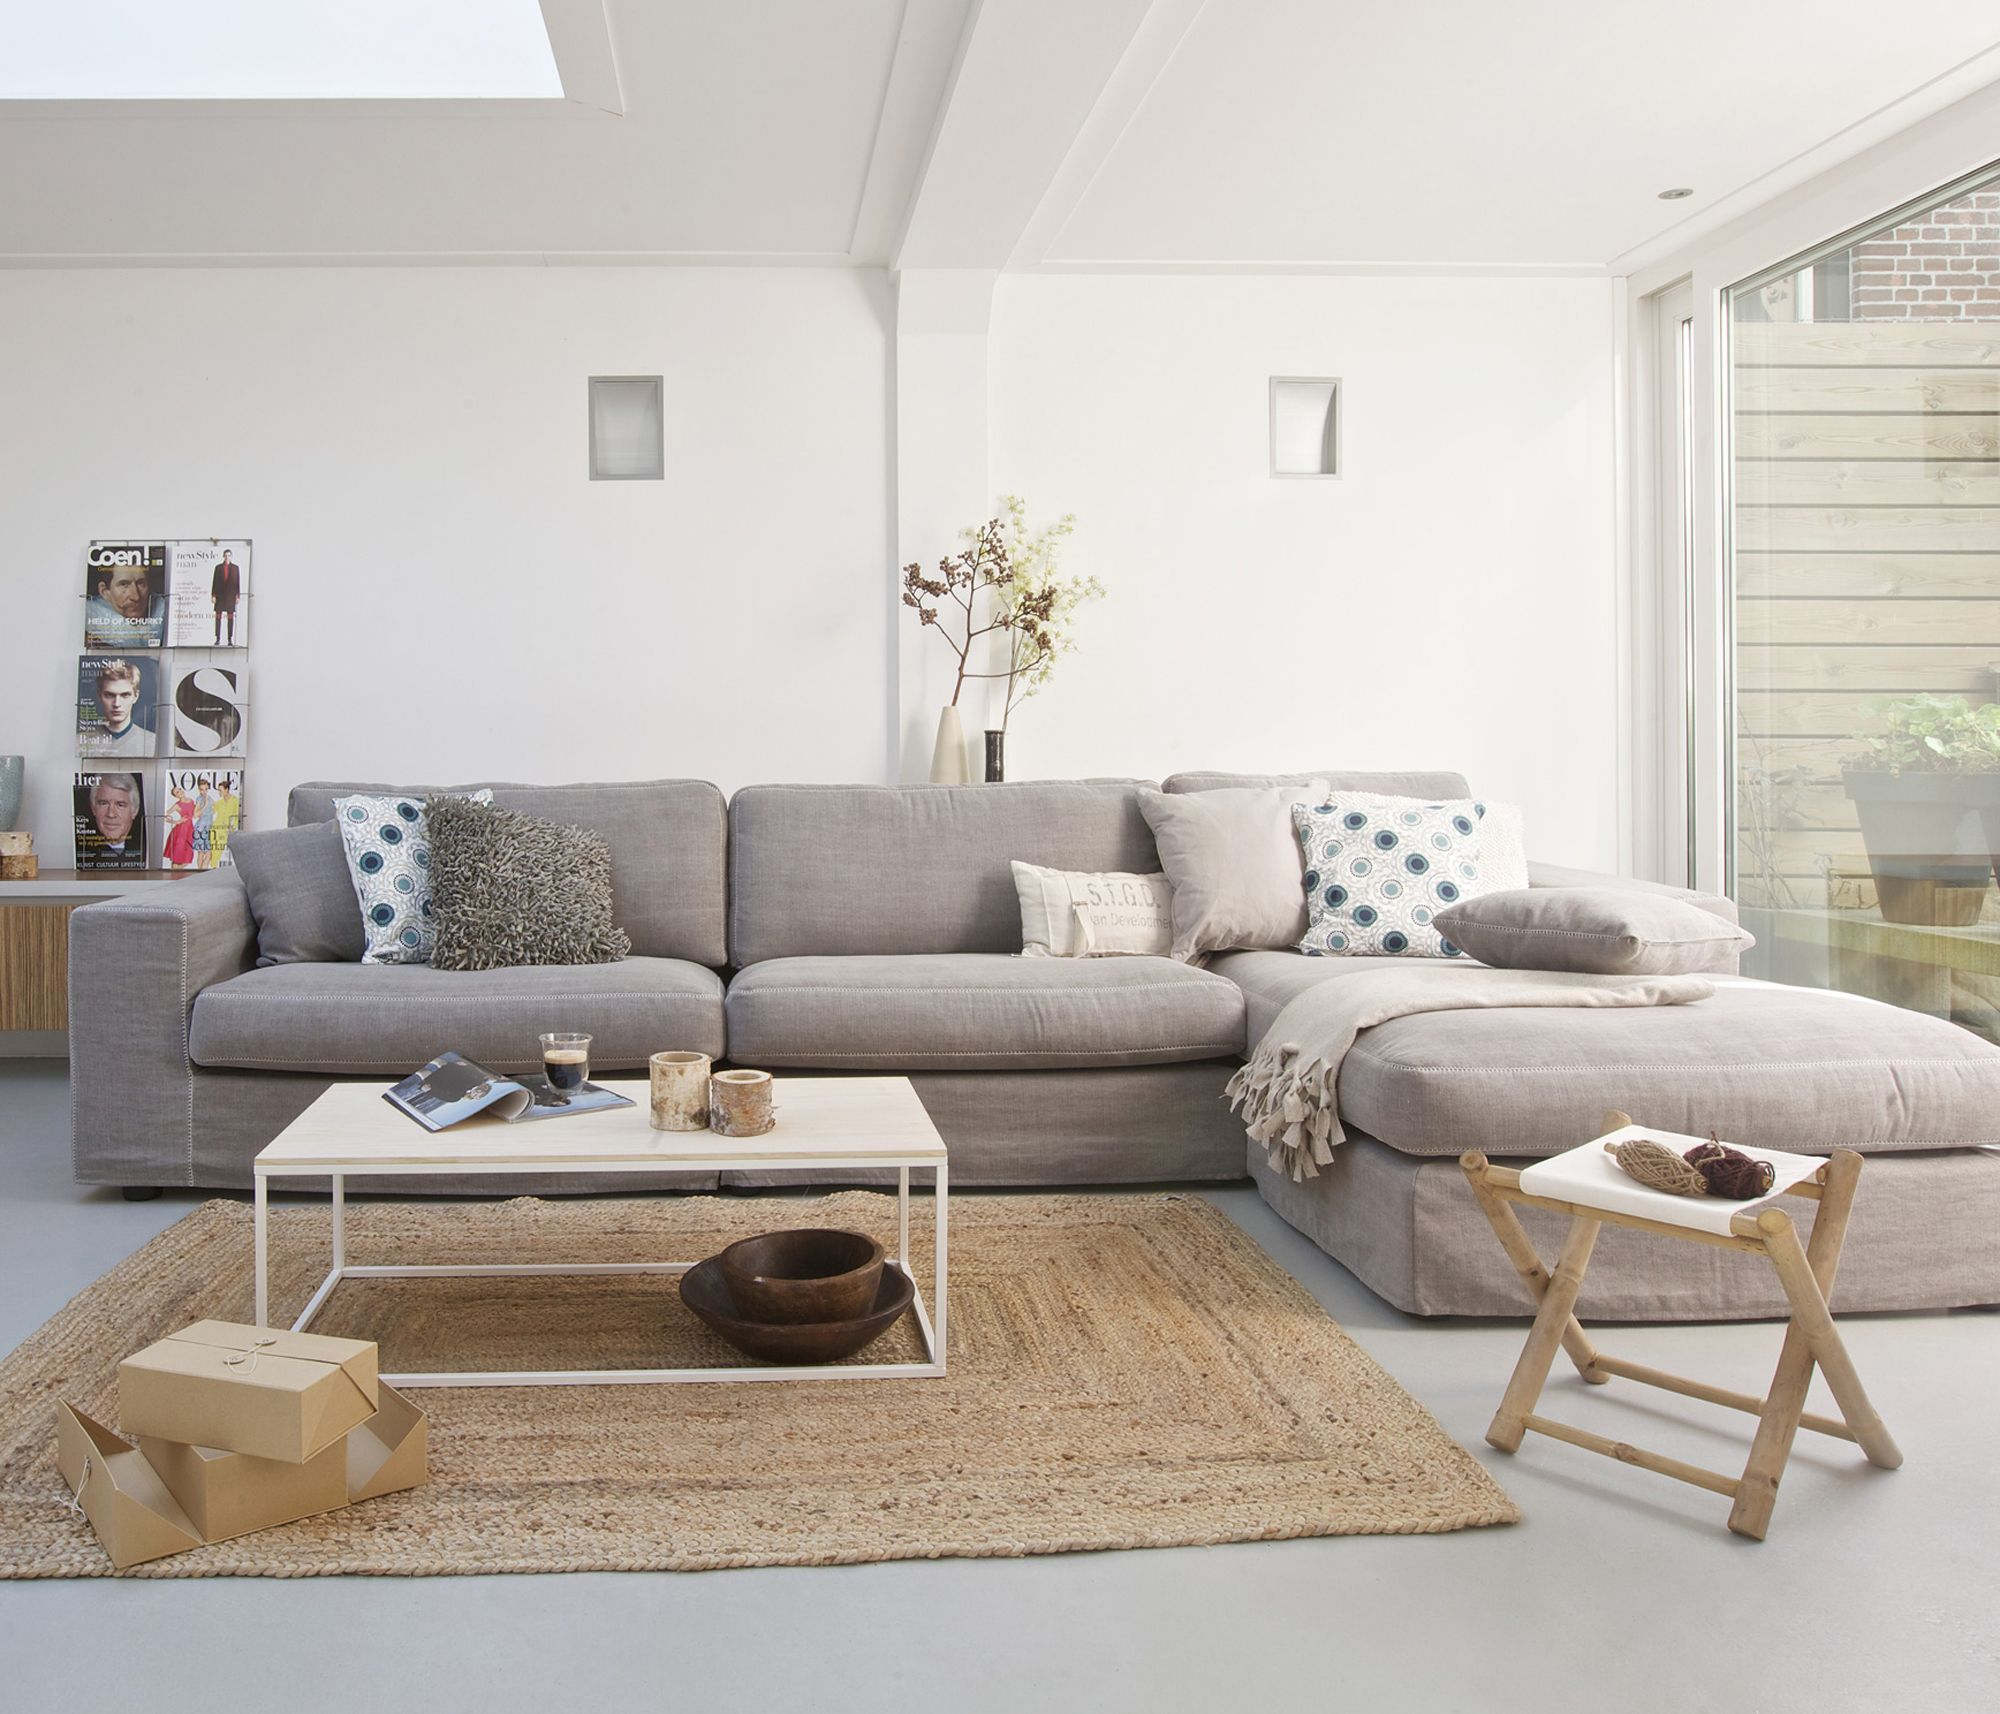 Grijze loungebank huisje pinterest living rooms and interiors - Grijze lounge taupe ...